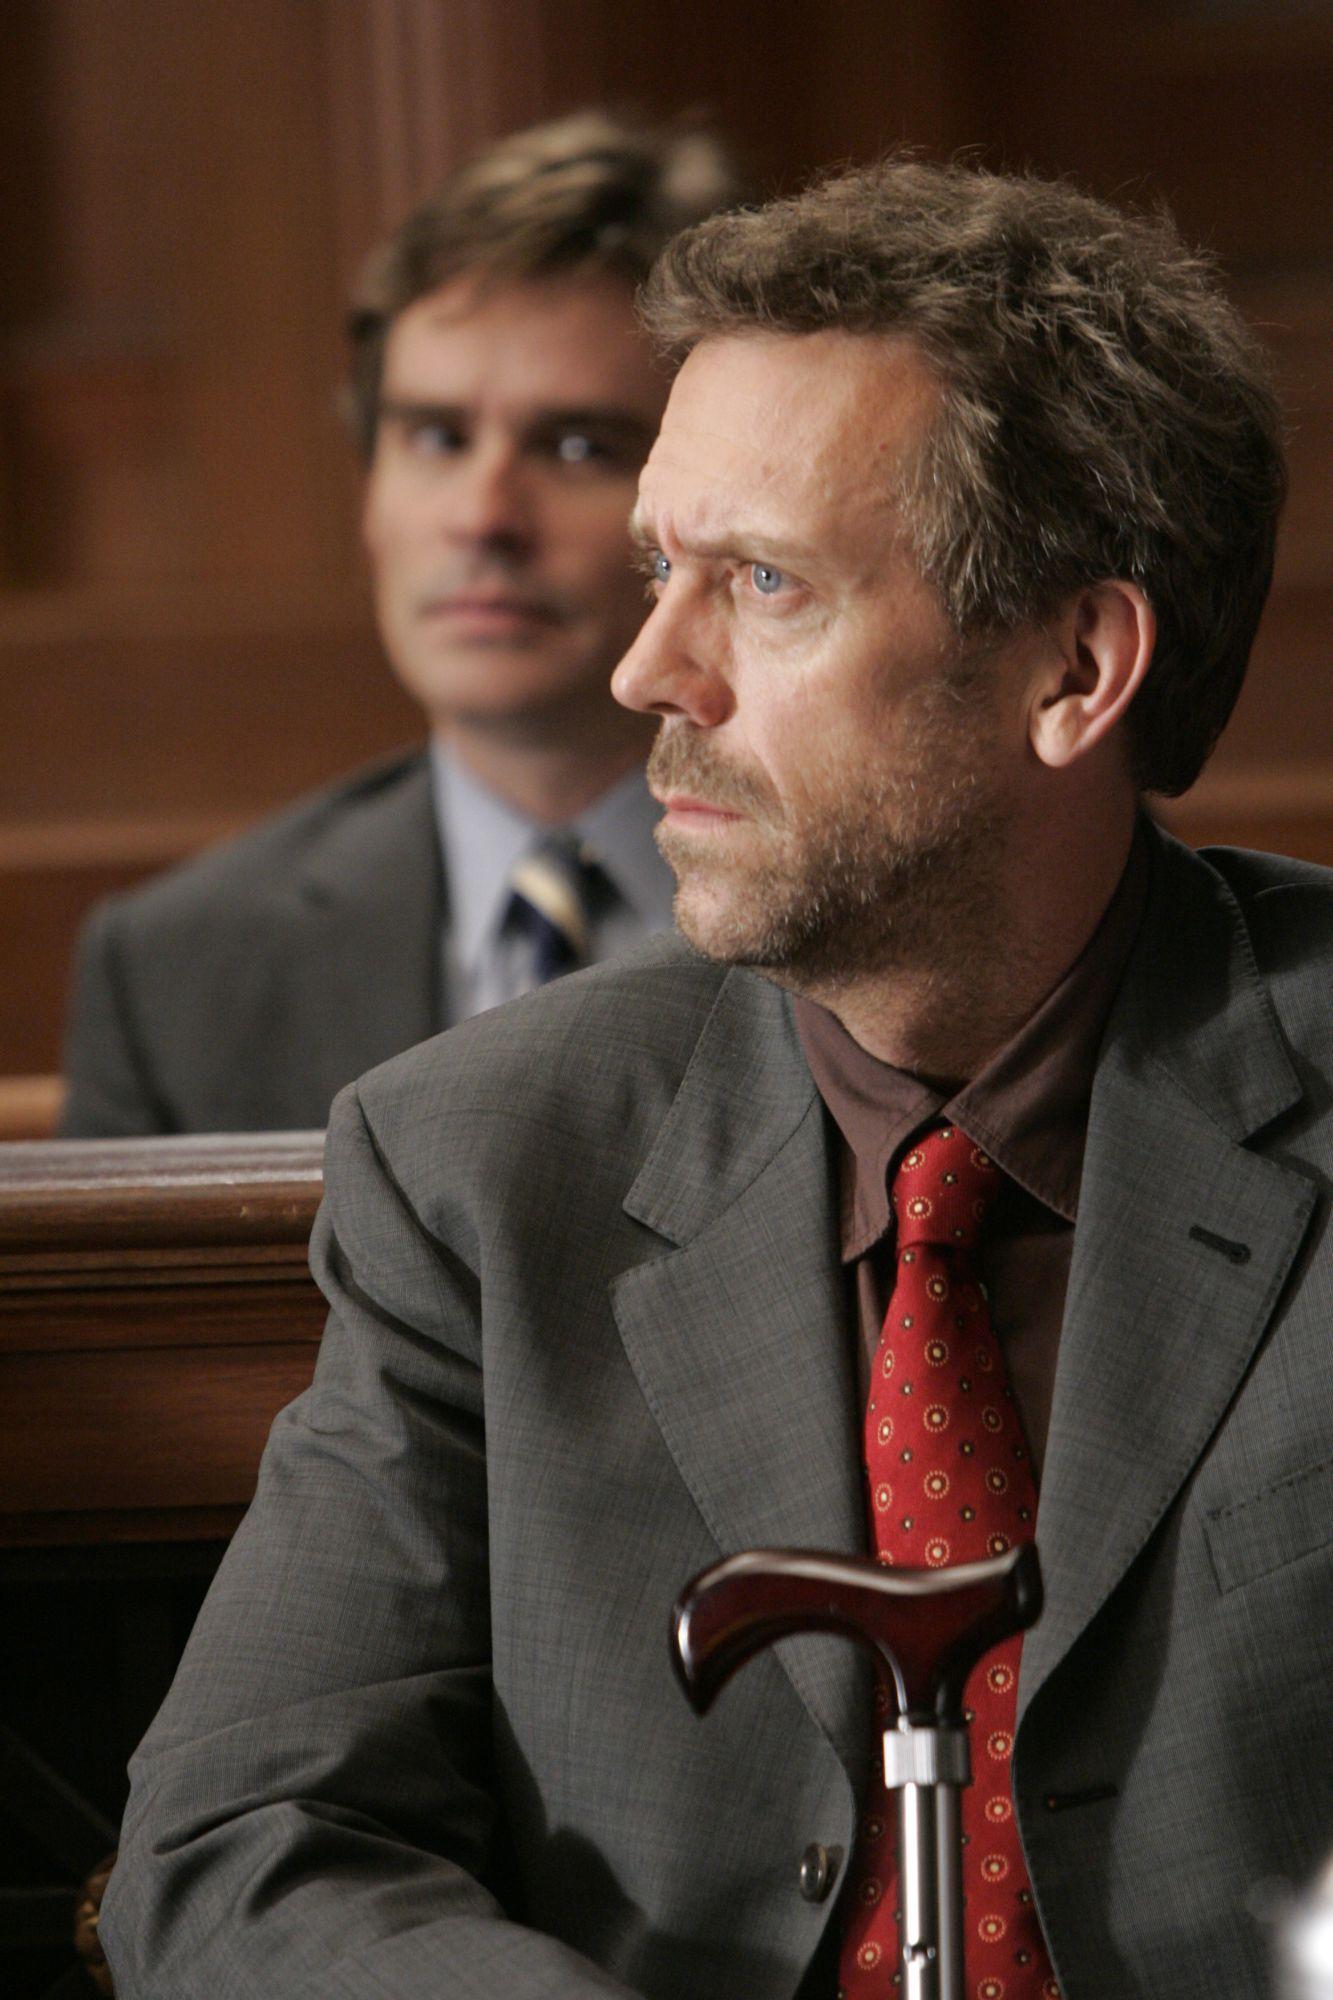 House Season 3 Episode 11 Still Dr house, Hugh laurie